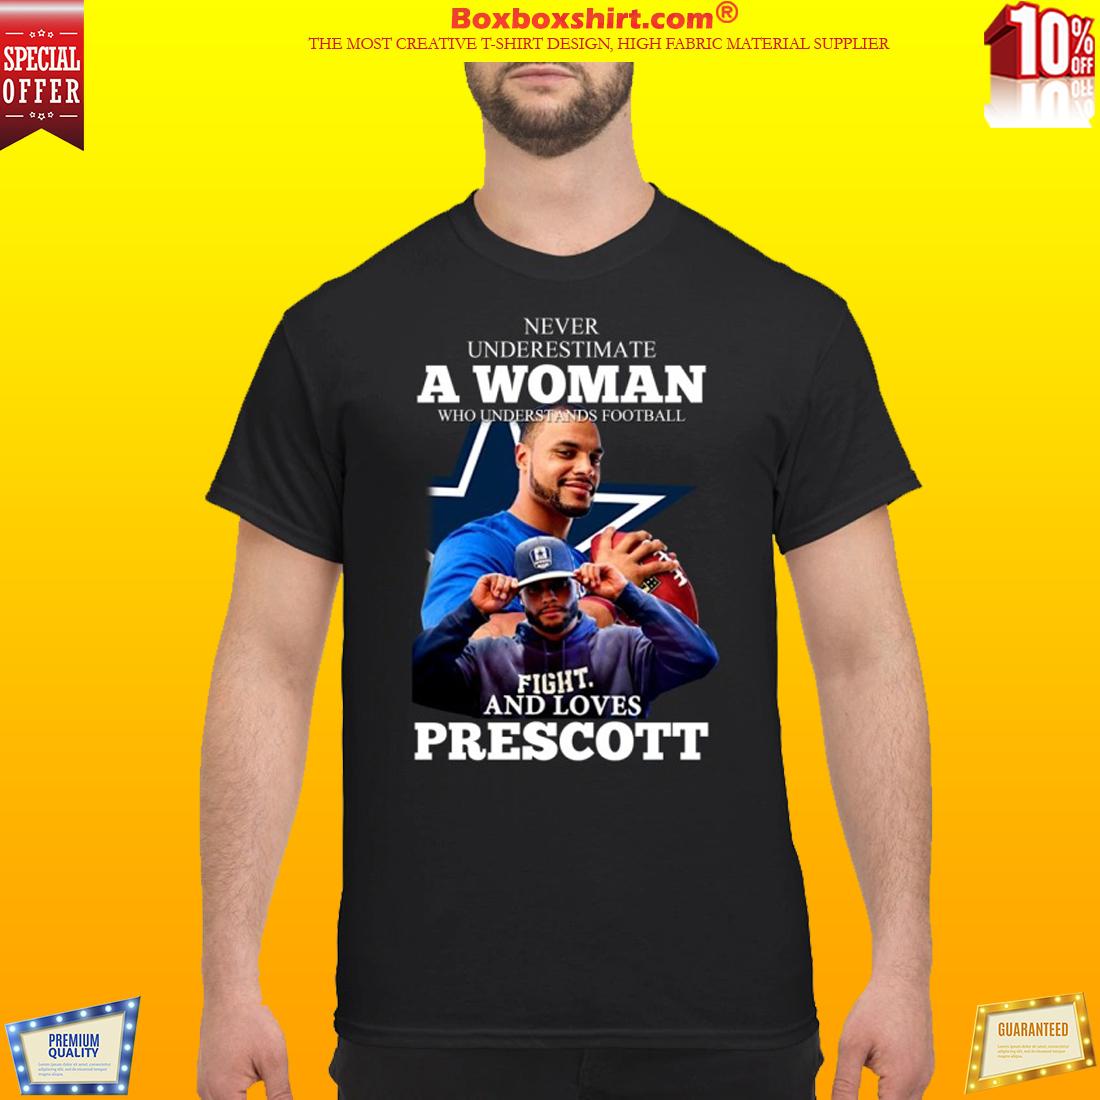 Never underestimate a woman who understands football and loves Prescott shirt